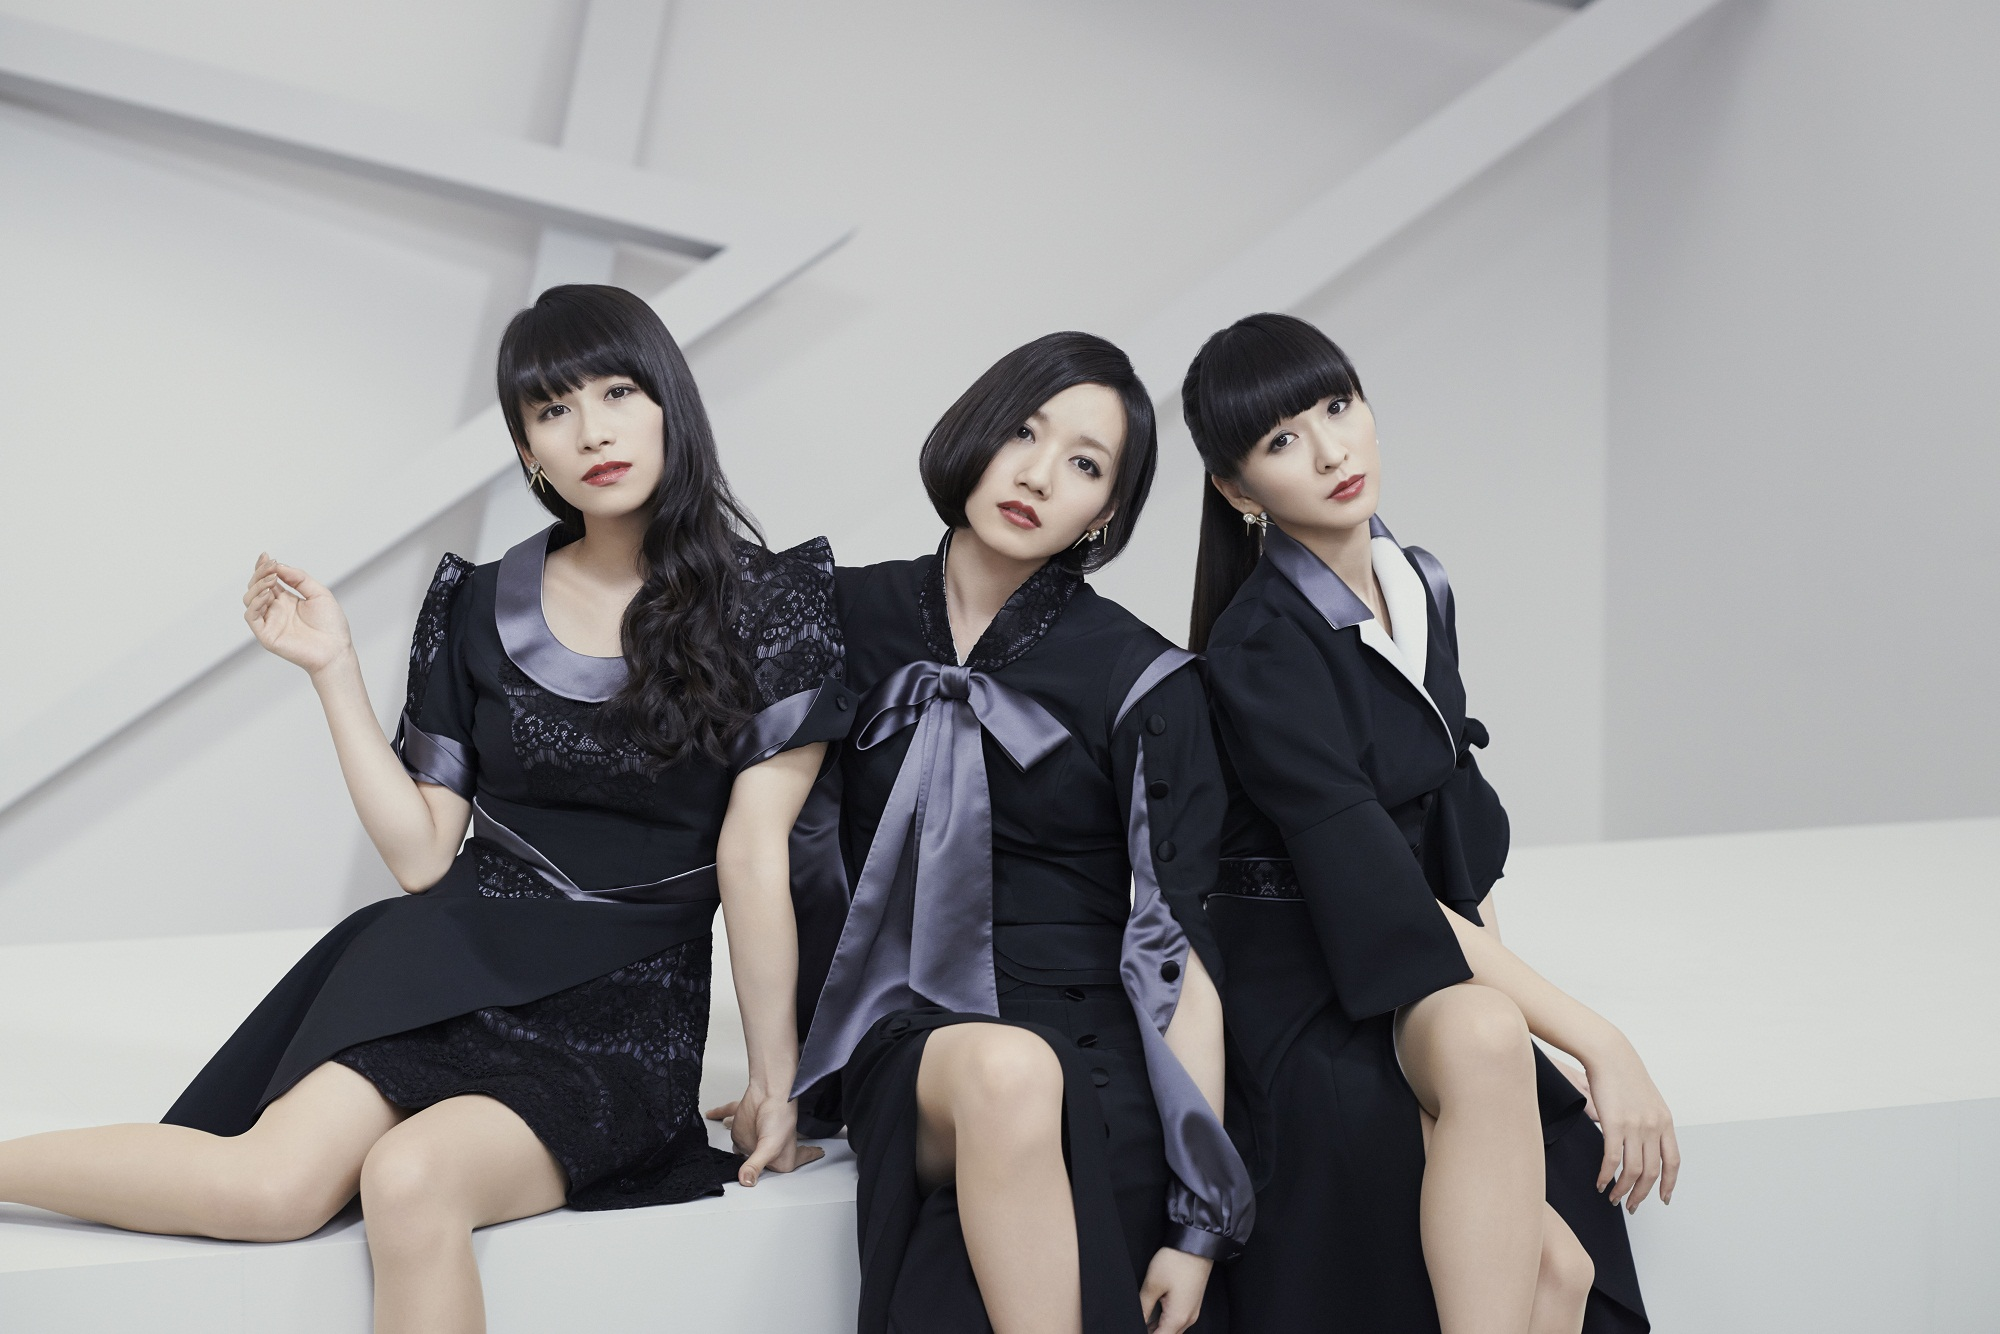 "Perfumeの斬新なファッション ""近未来でかわいい"" MVの衣装4選"